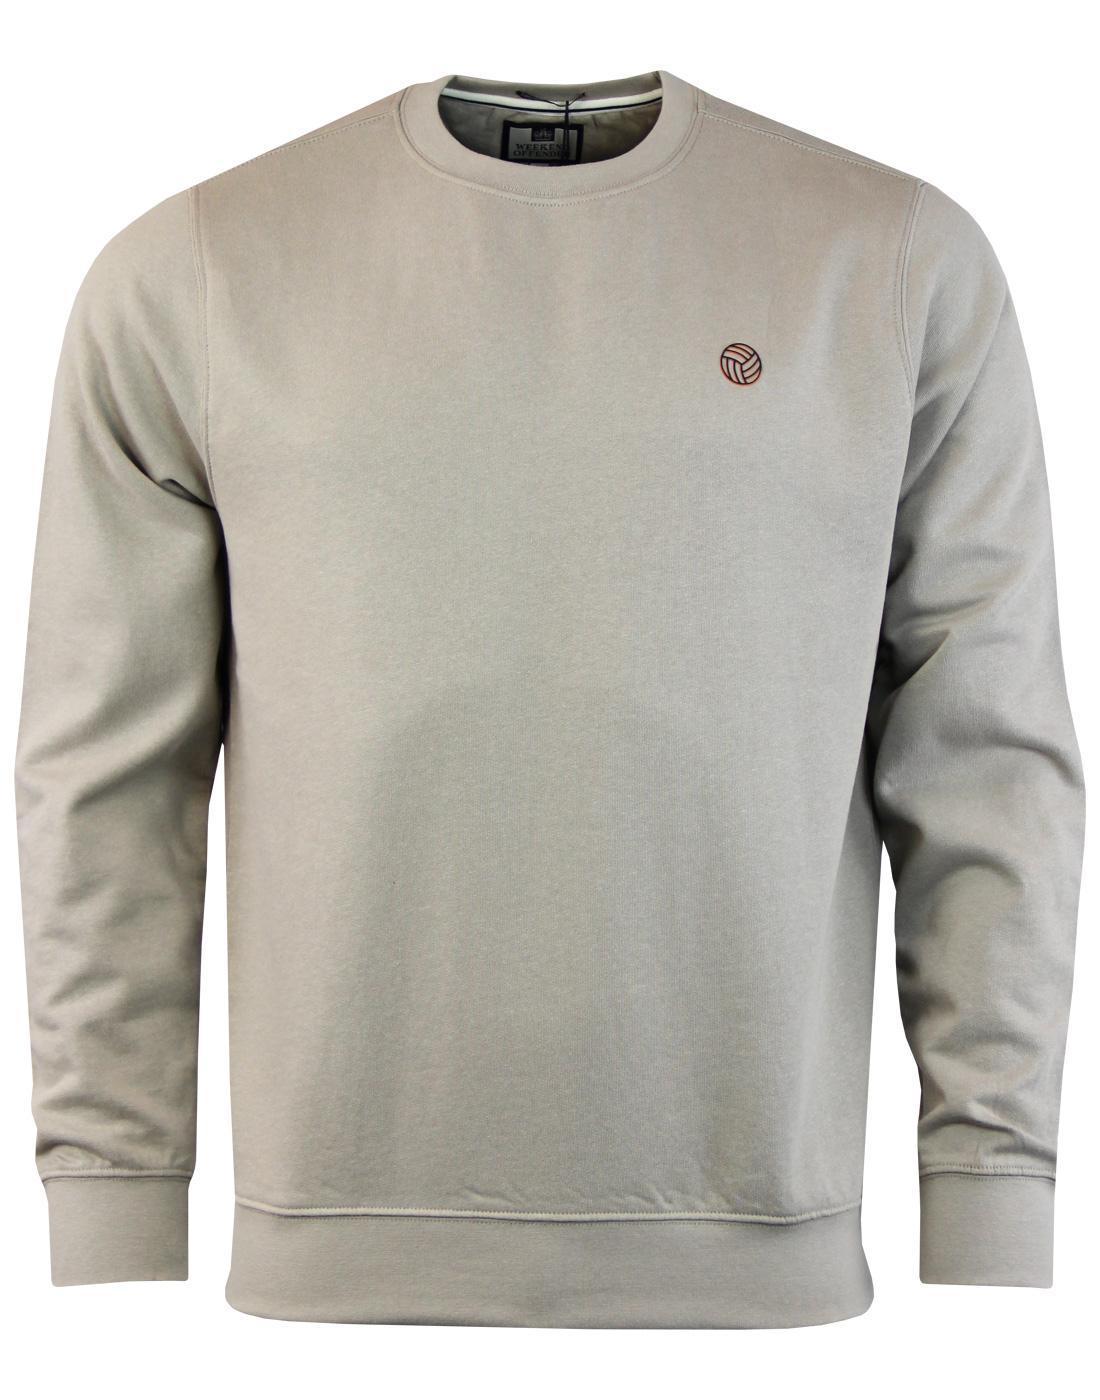 Andress AMF WEEKEND OFFENDER Football Sweatshirt